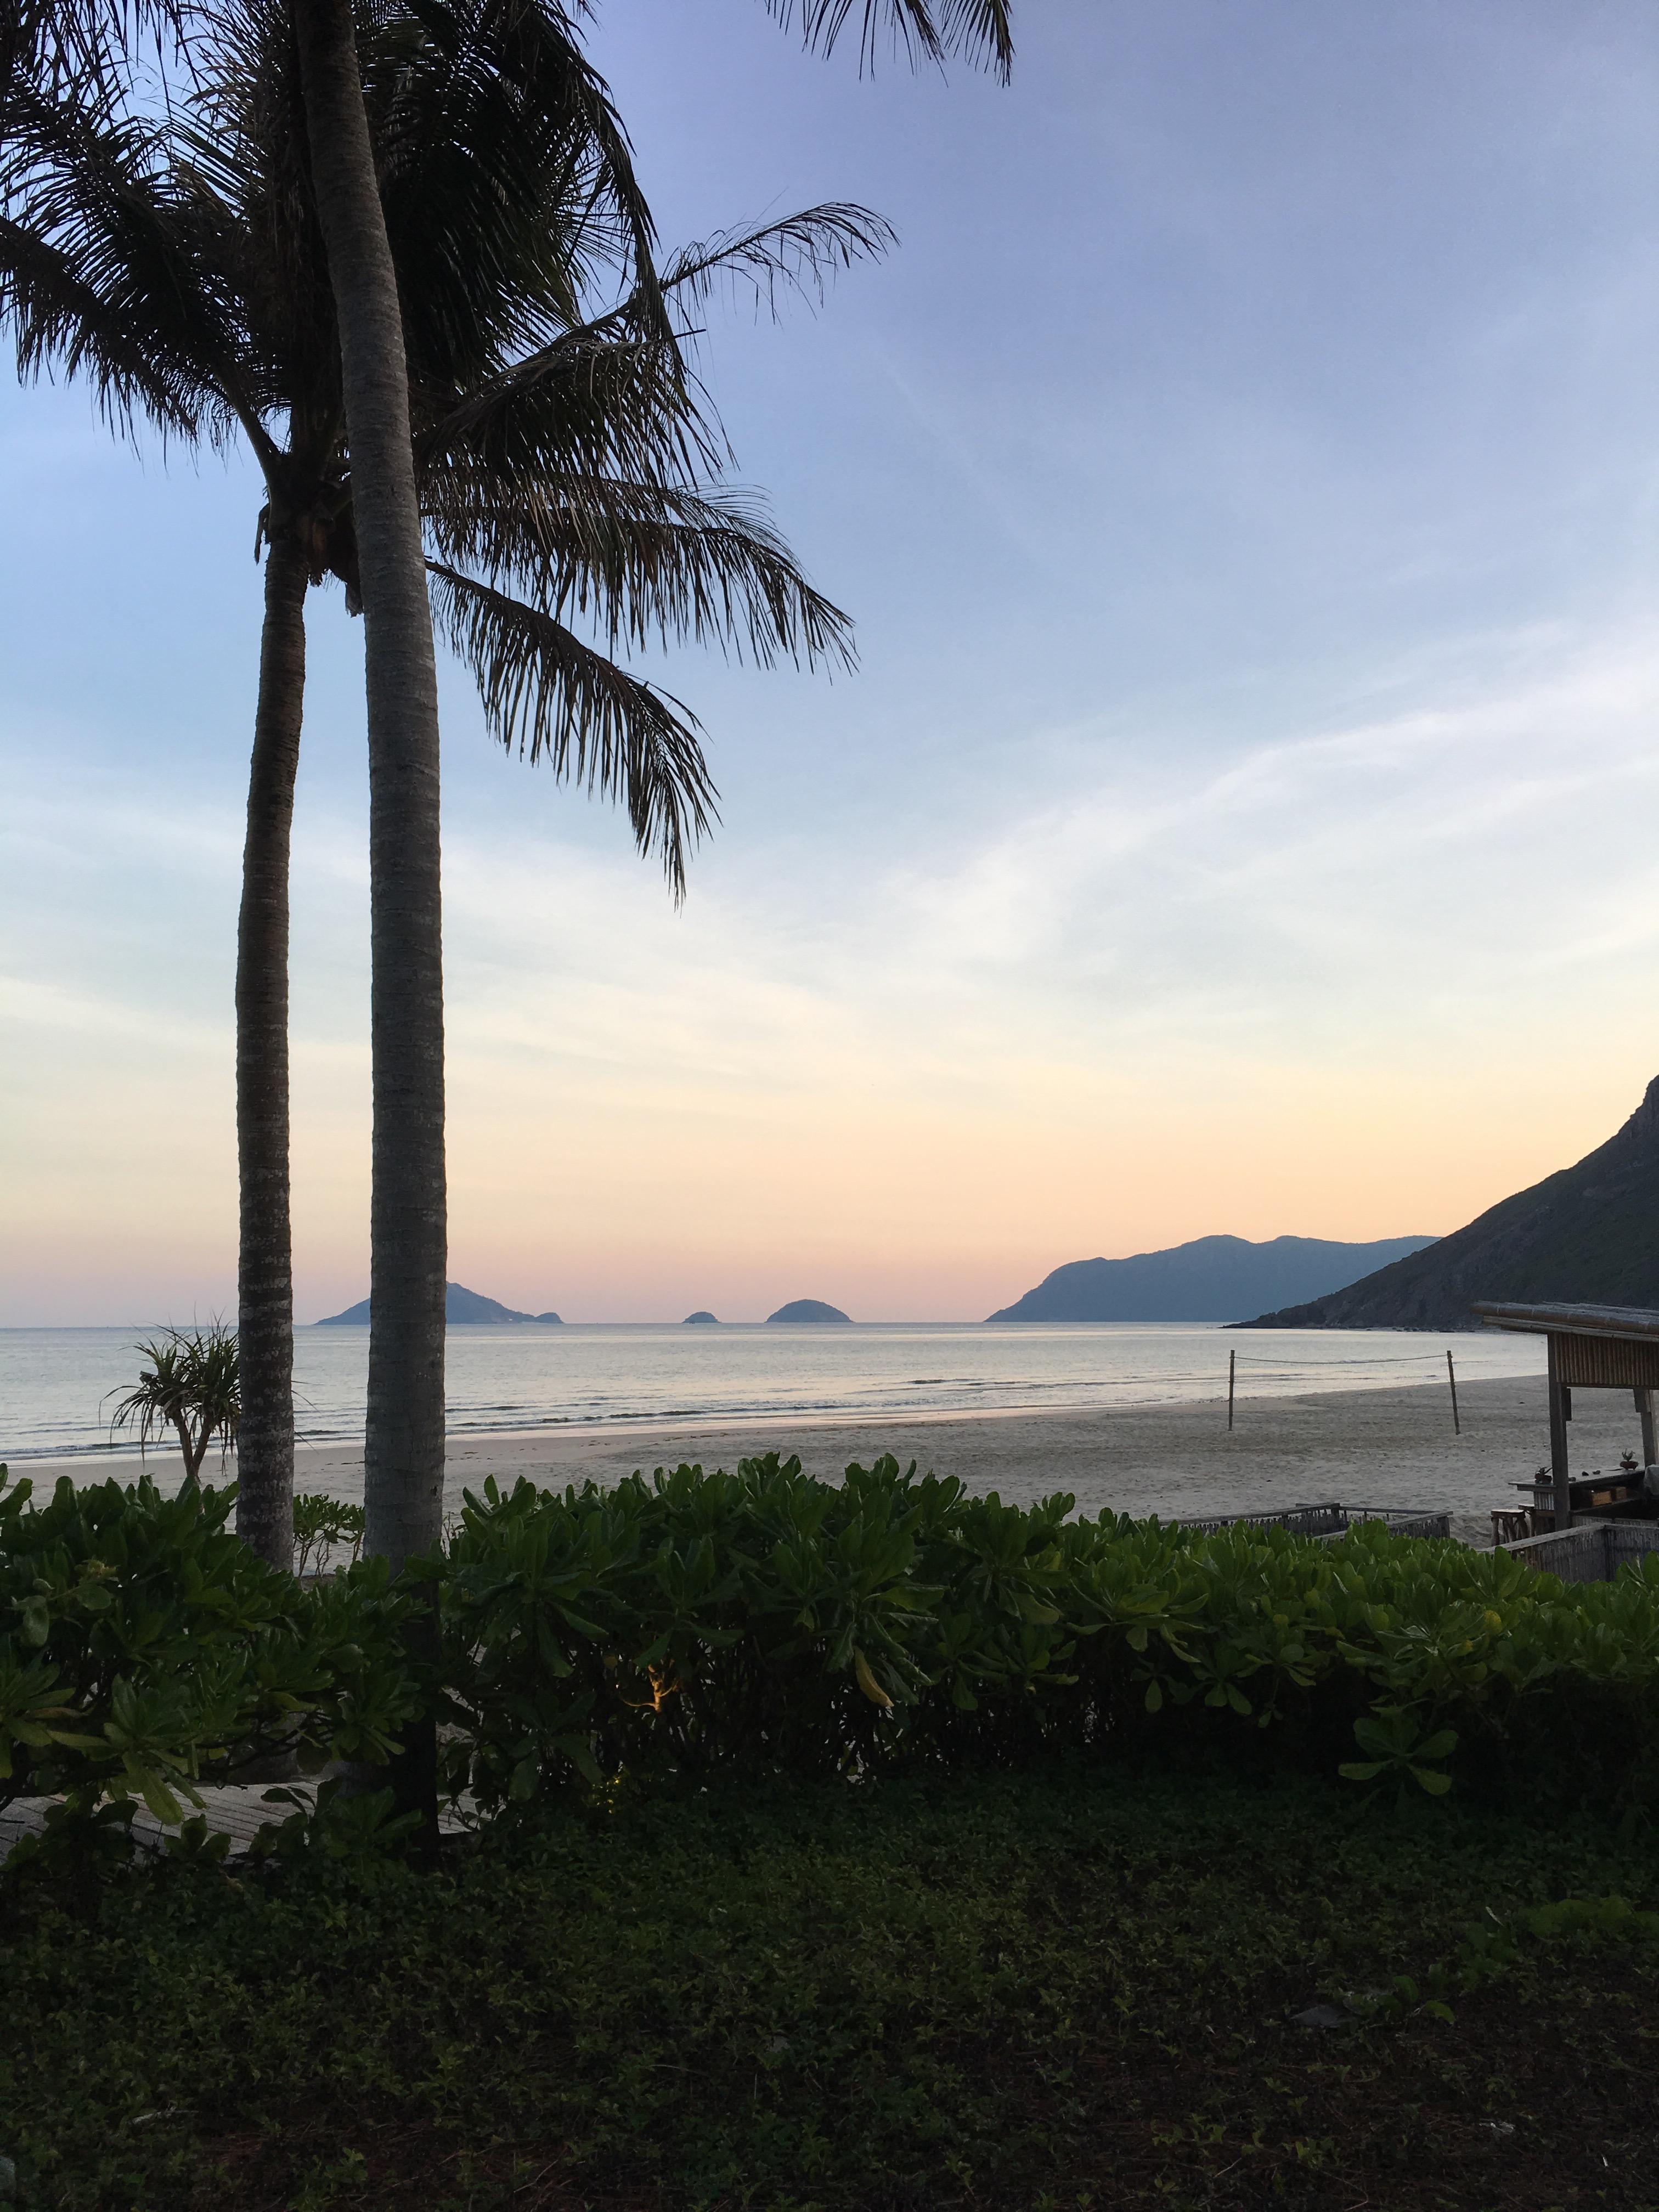 Six senses_beach_sunset_palm tree_Con Dao_Vietnam